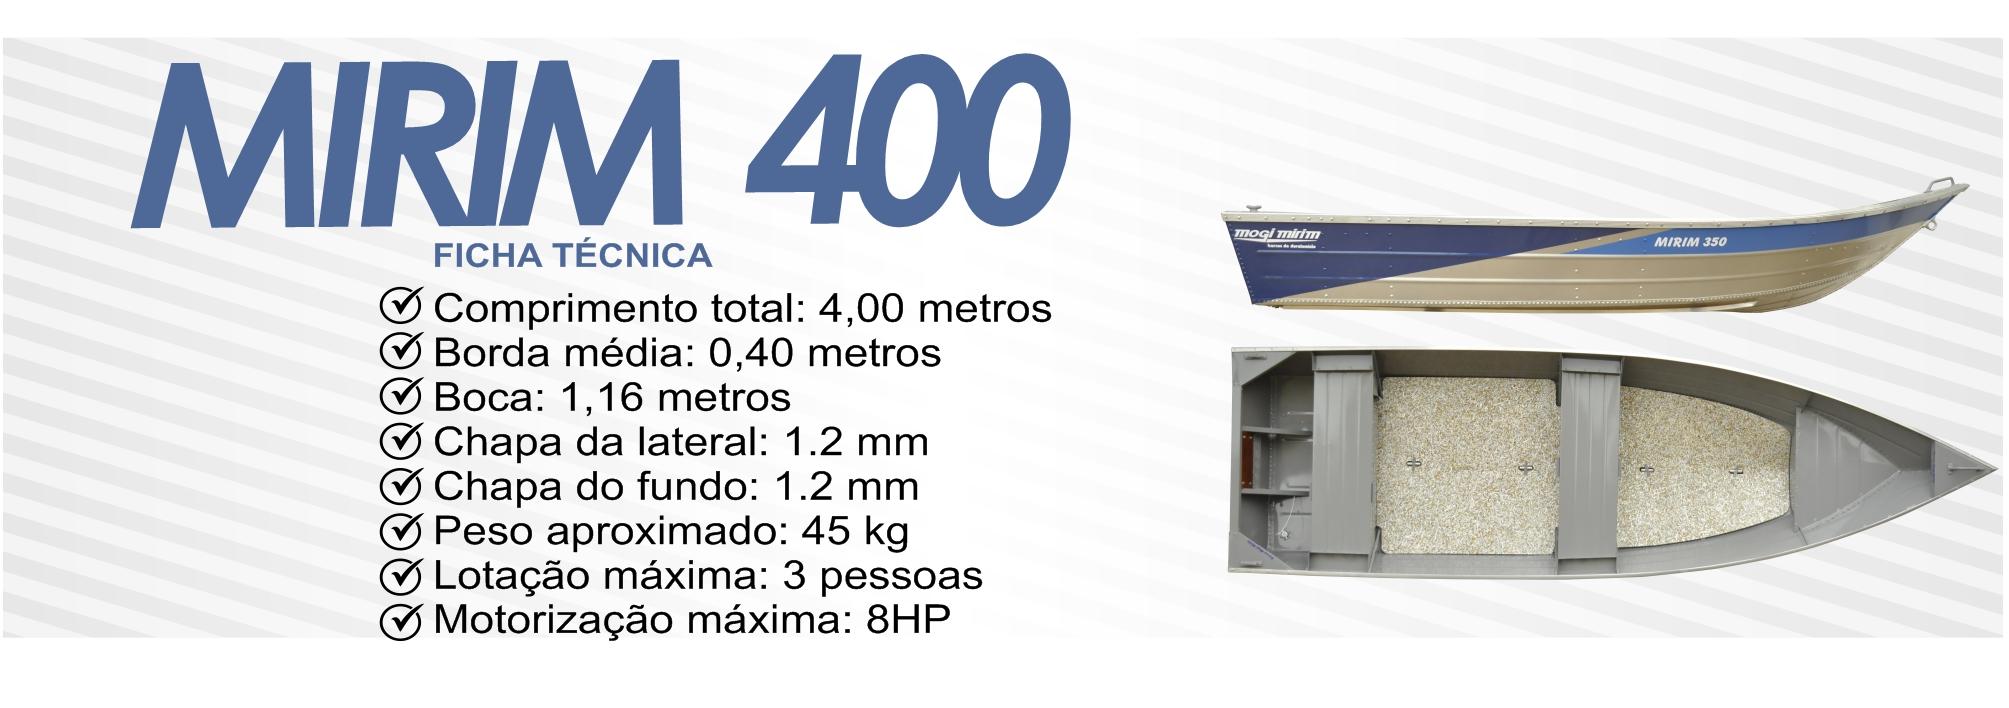 Mirim 300